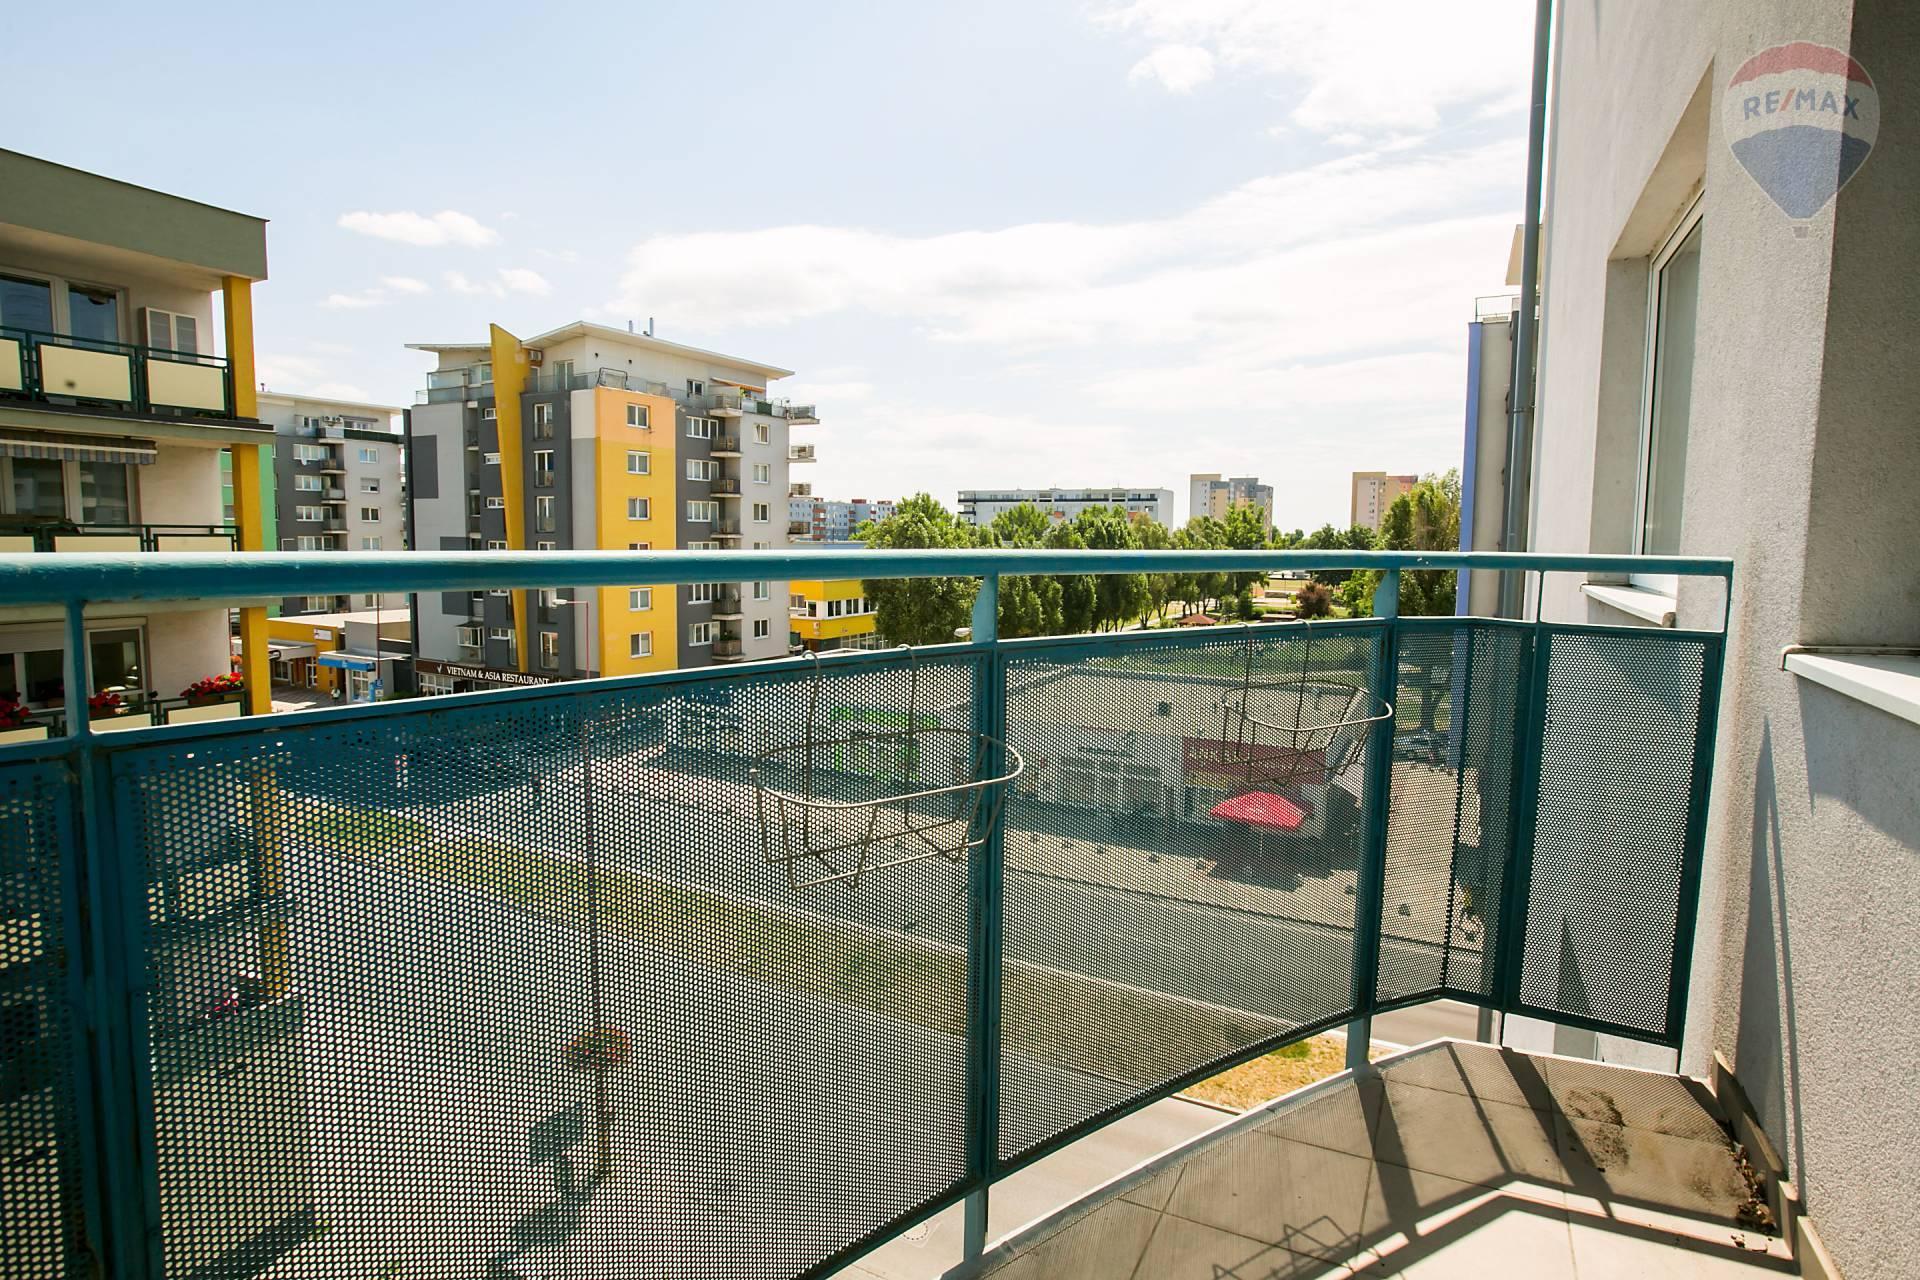 Prenájom bytu (2 izbový) 48 m2, Bratislava - Podunajské Biskupice - balkón